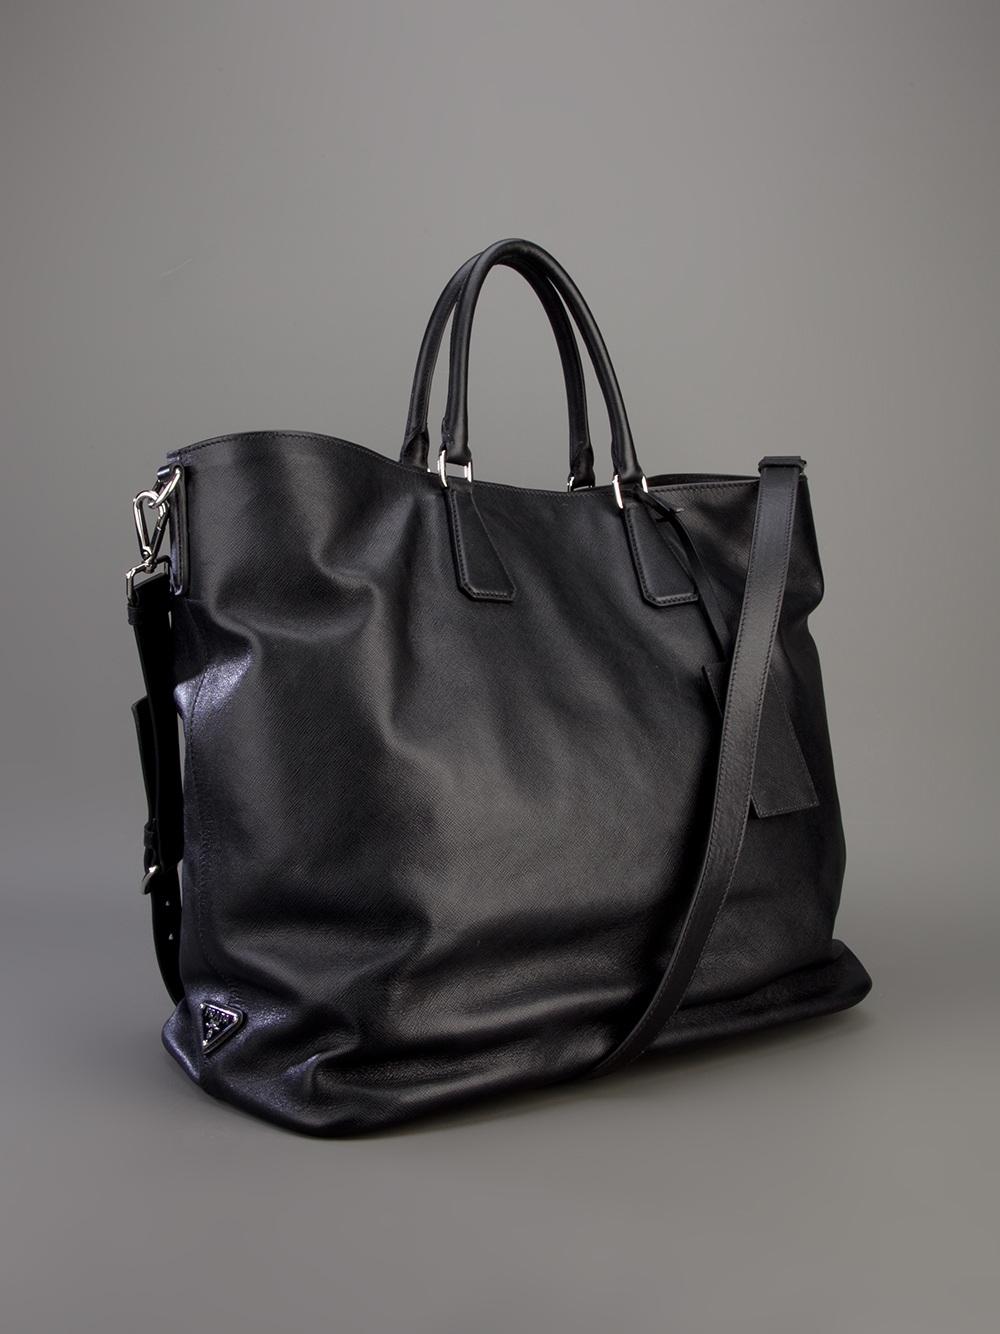 c52cf11ff460 ... discount prada tote bag in black for men lyst 9f638 8963e